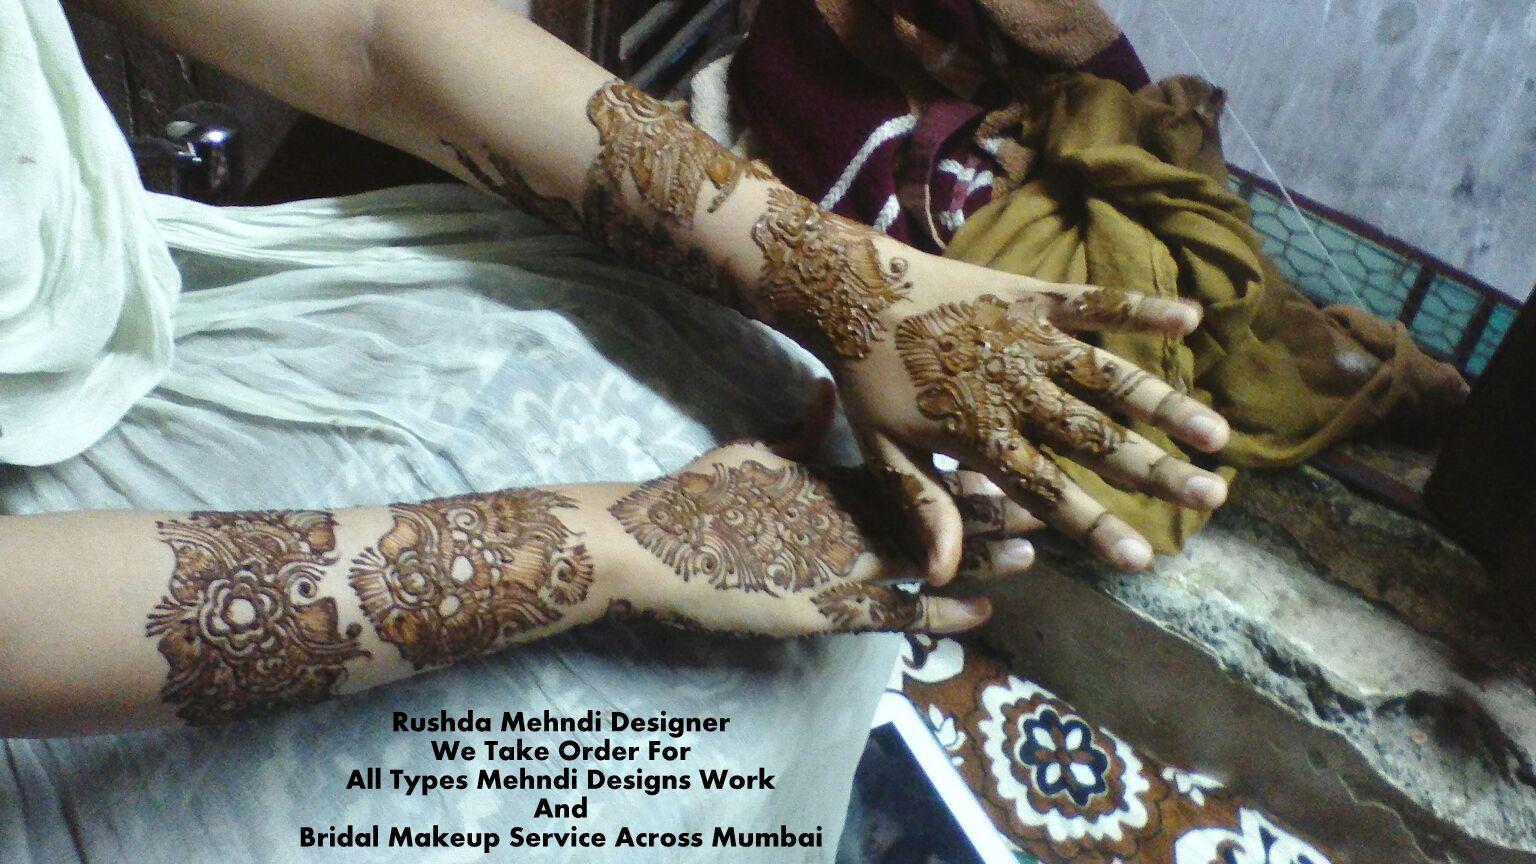 Mehndi Art Designs : Rushda mehndi designer heena artist in mumbai bridal